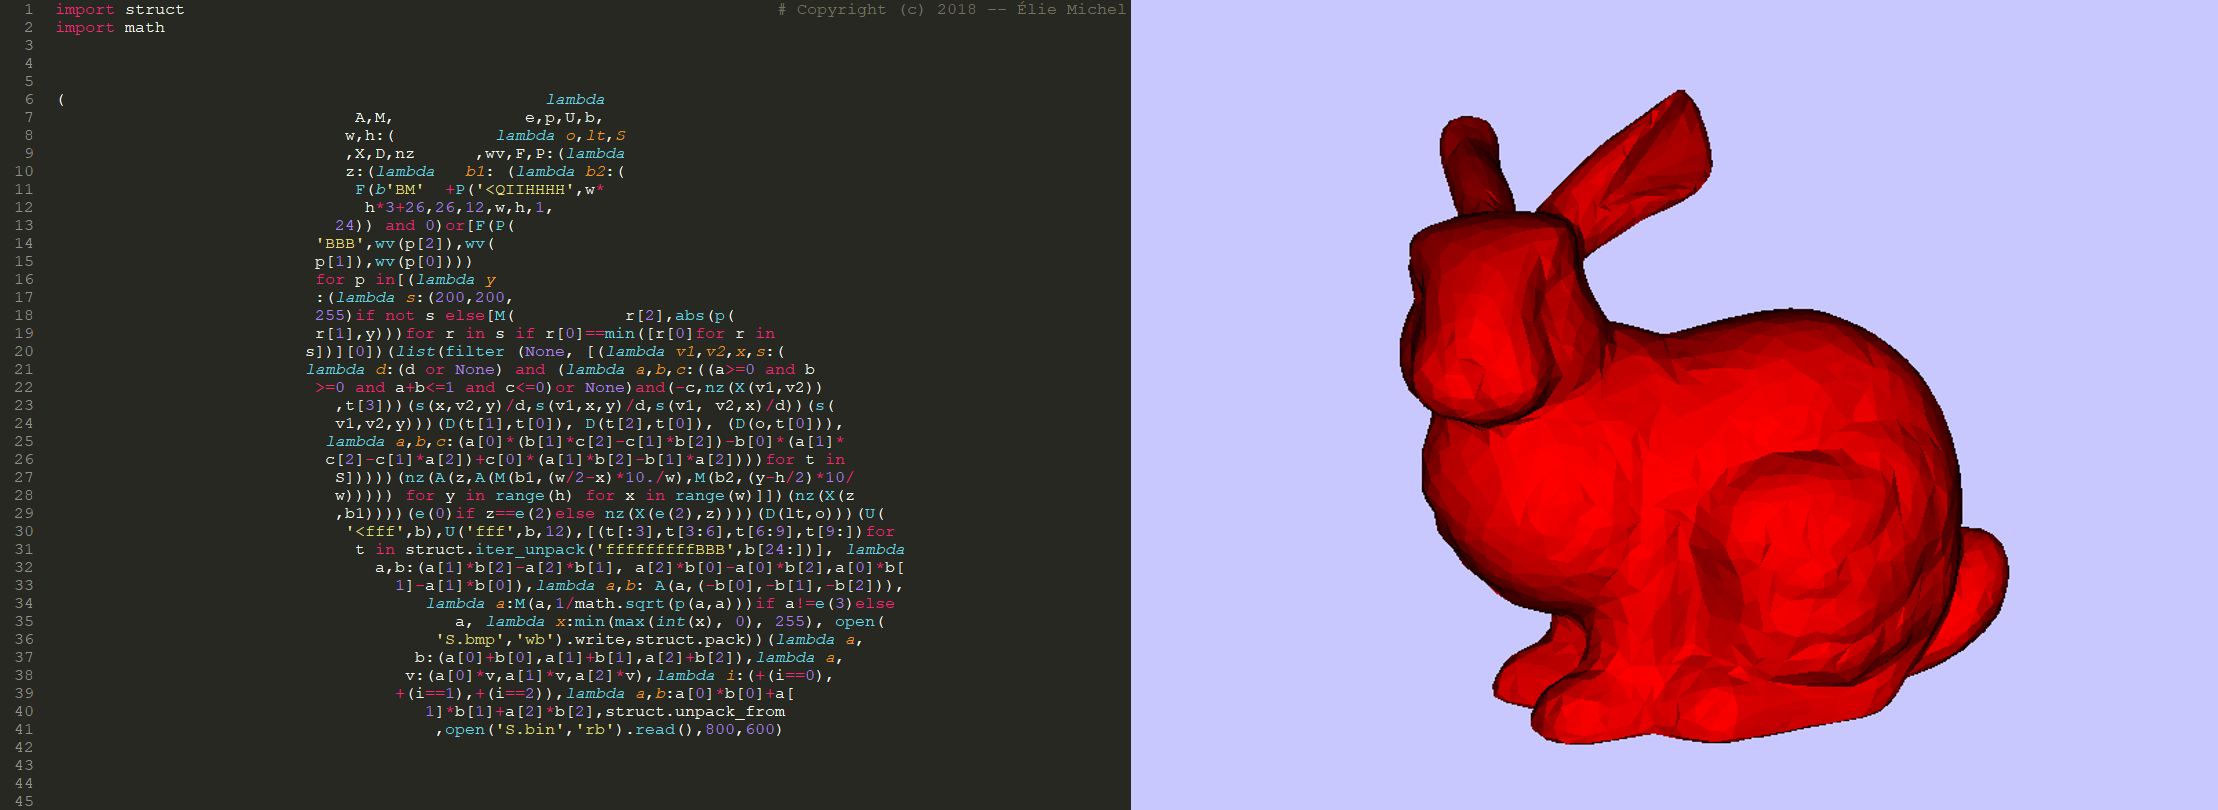 Obfuscated Python Bunny Calligram